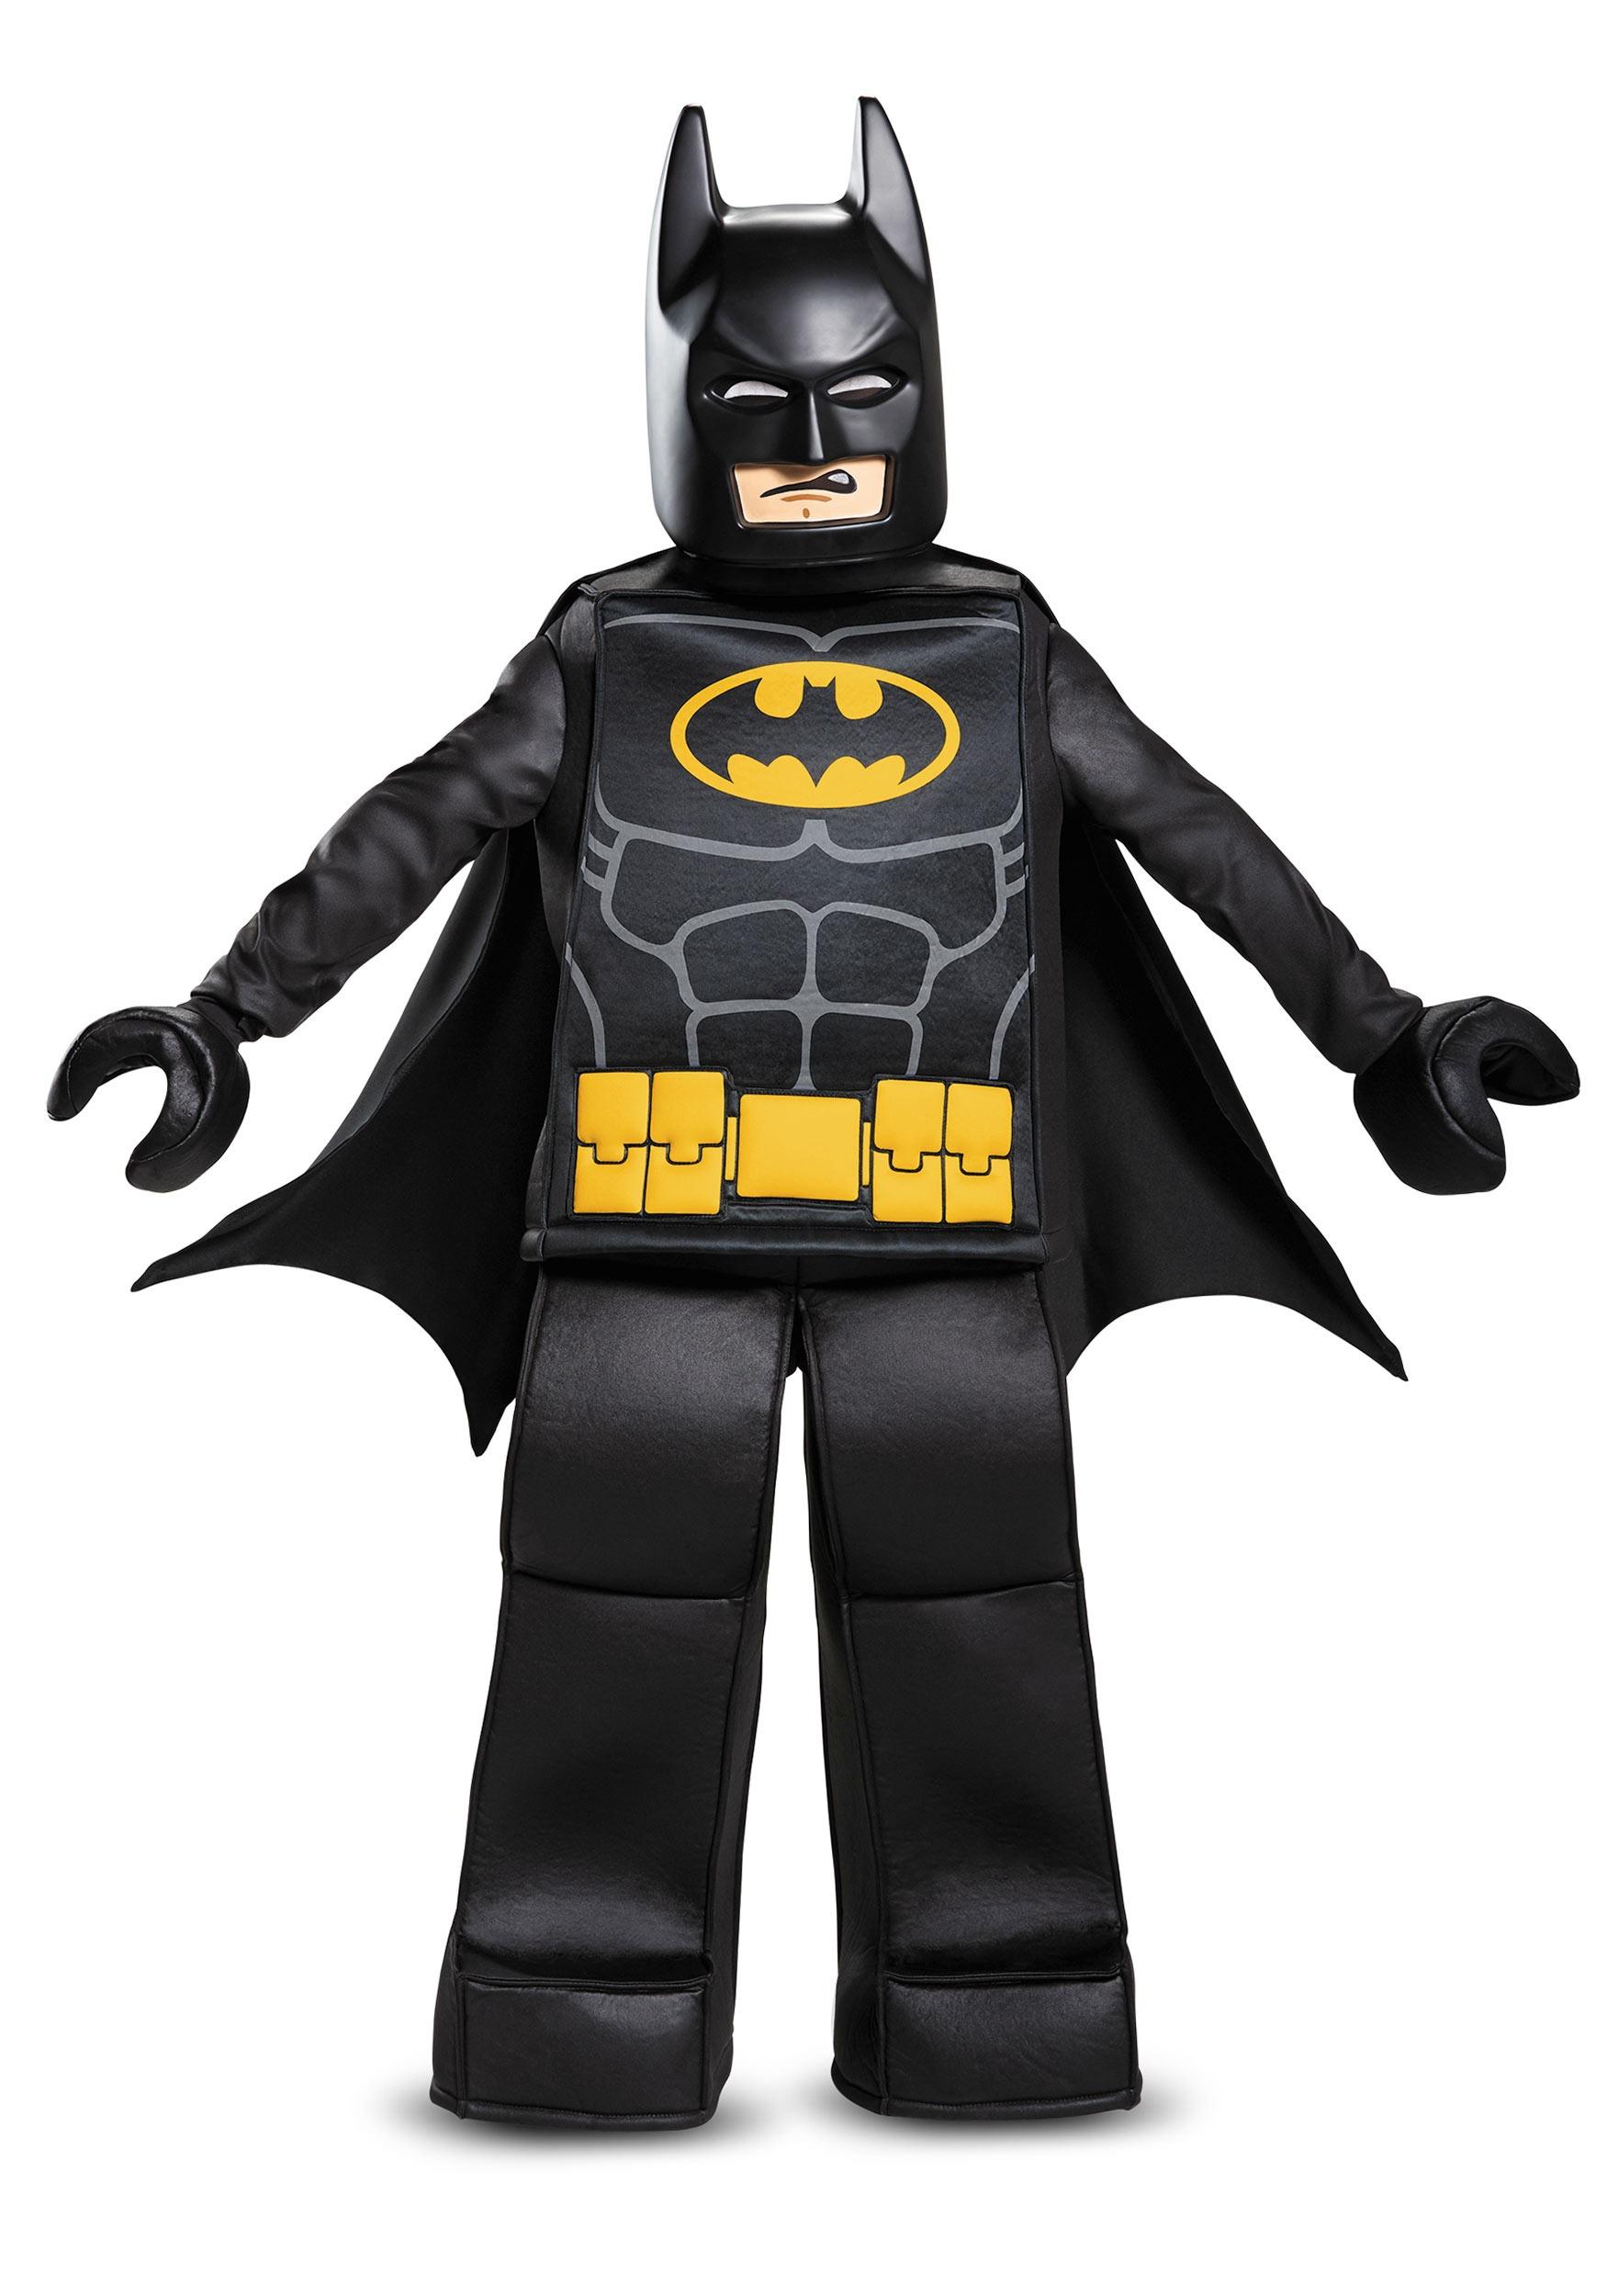 lego batman movie 2017 wallpapers high quality download free. Black Bedroom Furniture Sets. Home Design Ideas